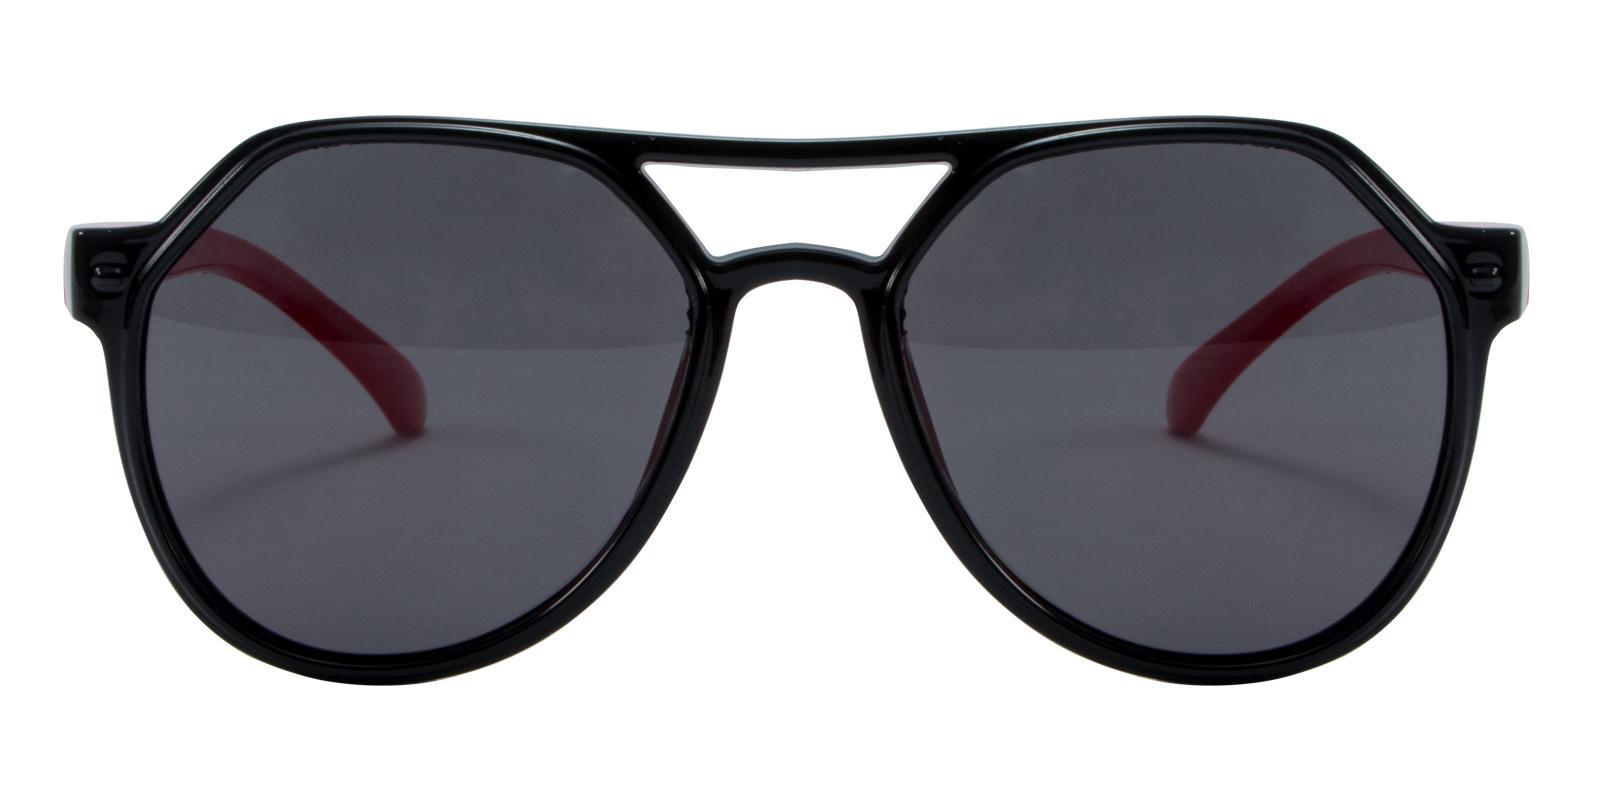 Pilot Black TR Sunglasses , UniversalBridgeFit Frames from ABBE Glasses